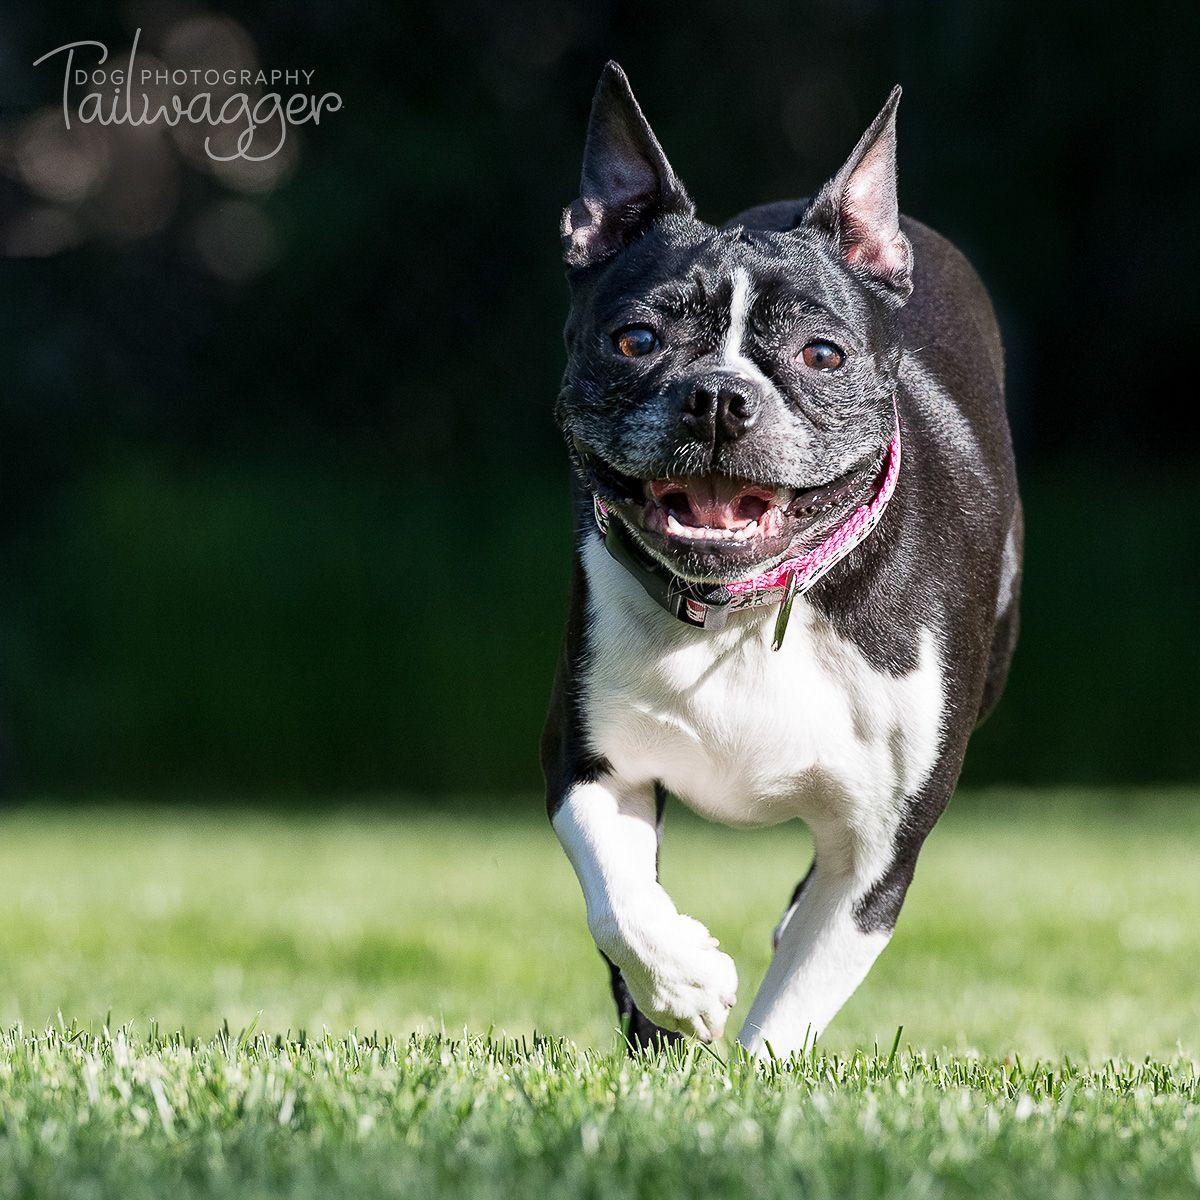 Look at that girl run! frenchbulldog dogphotography